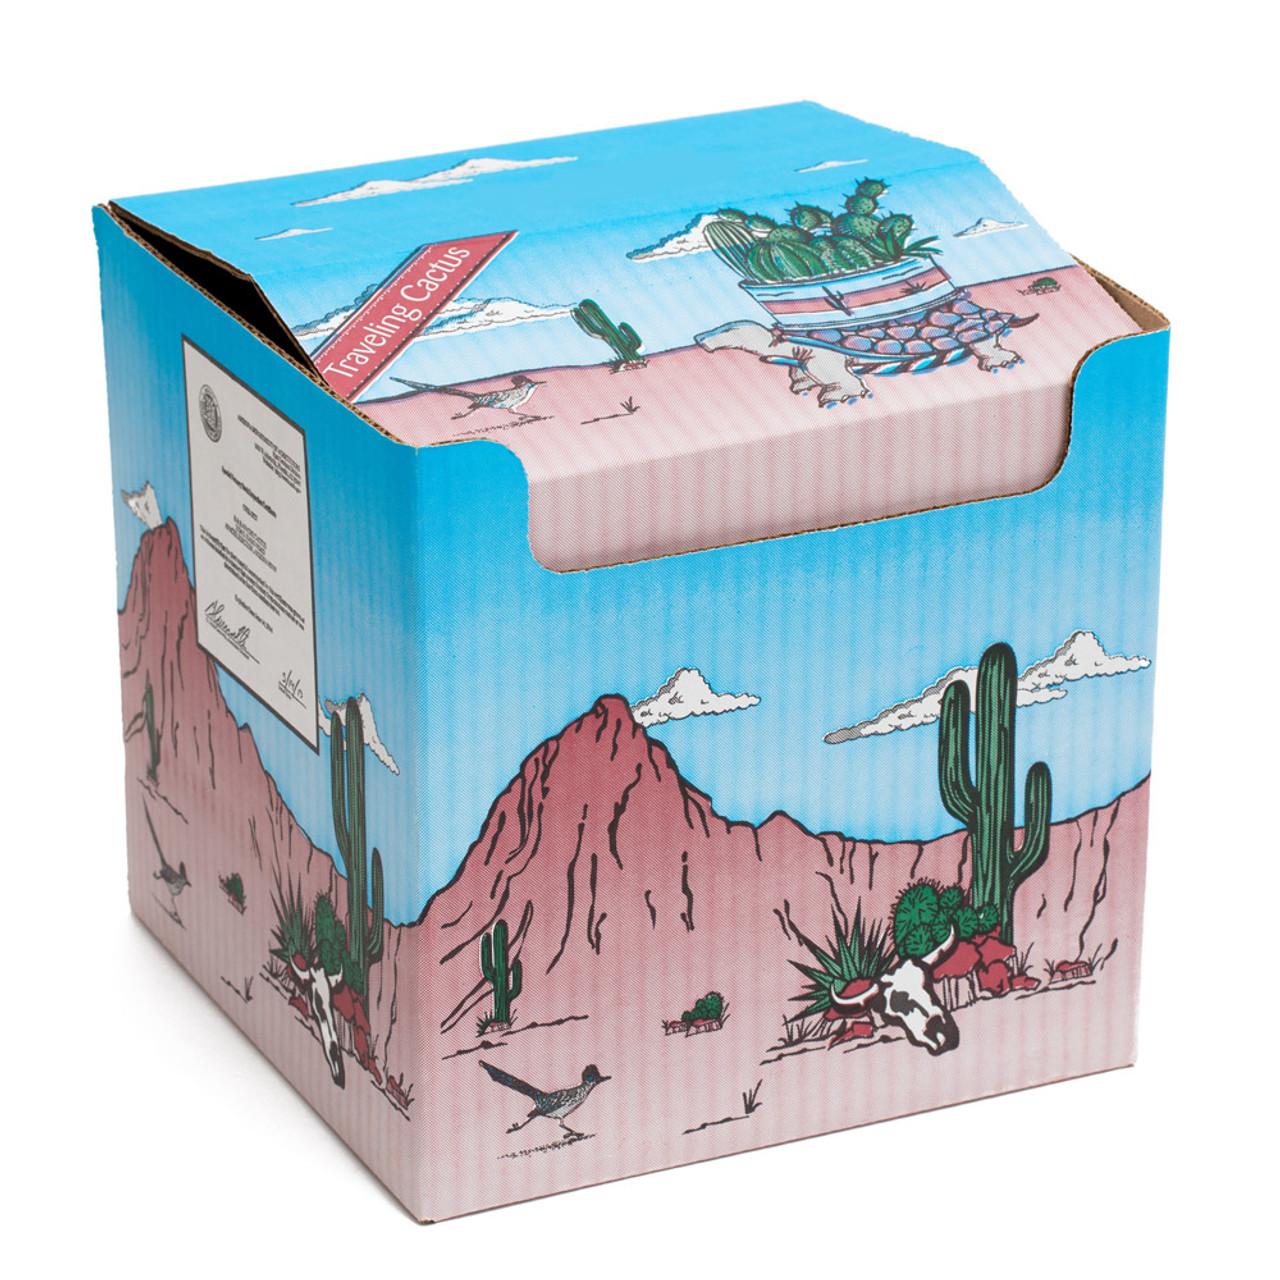 Cactus Travel Kit - 4 inch